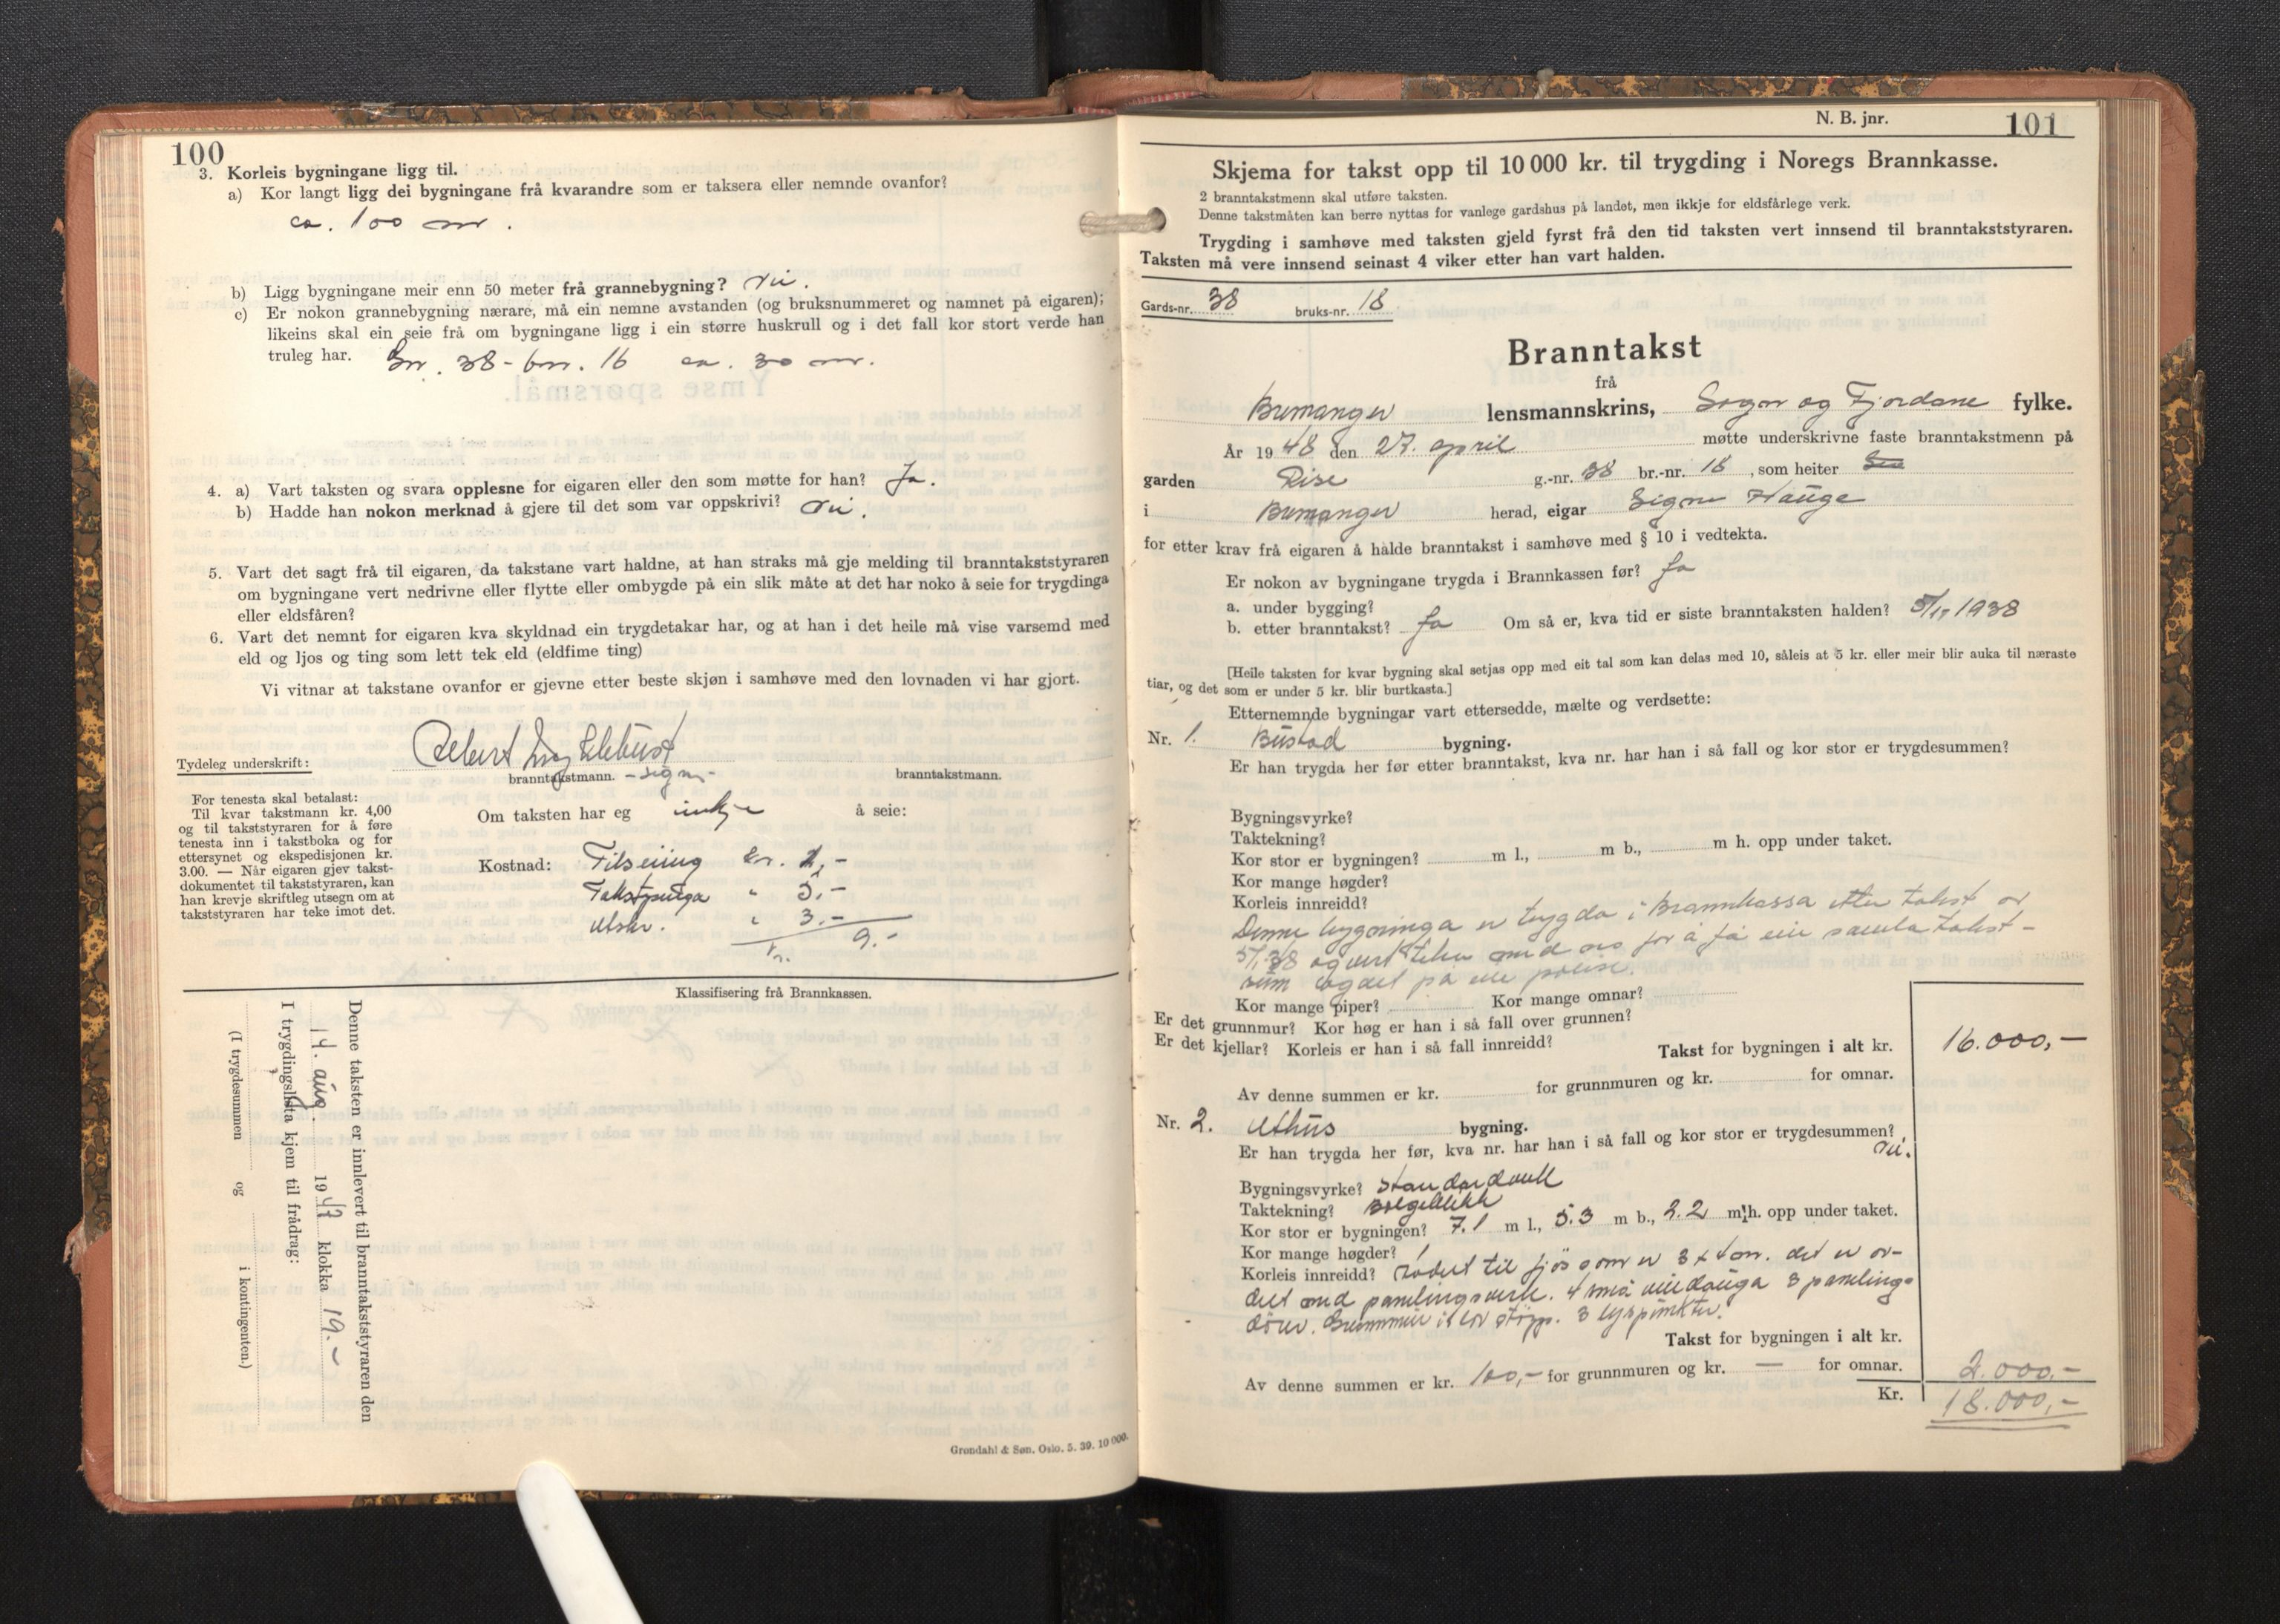 SAB, Lensmannen i Bremanger, 0012/L0009: Branntakstprotokoll, skjematakst, 1943-1950, s. 100-101